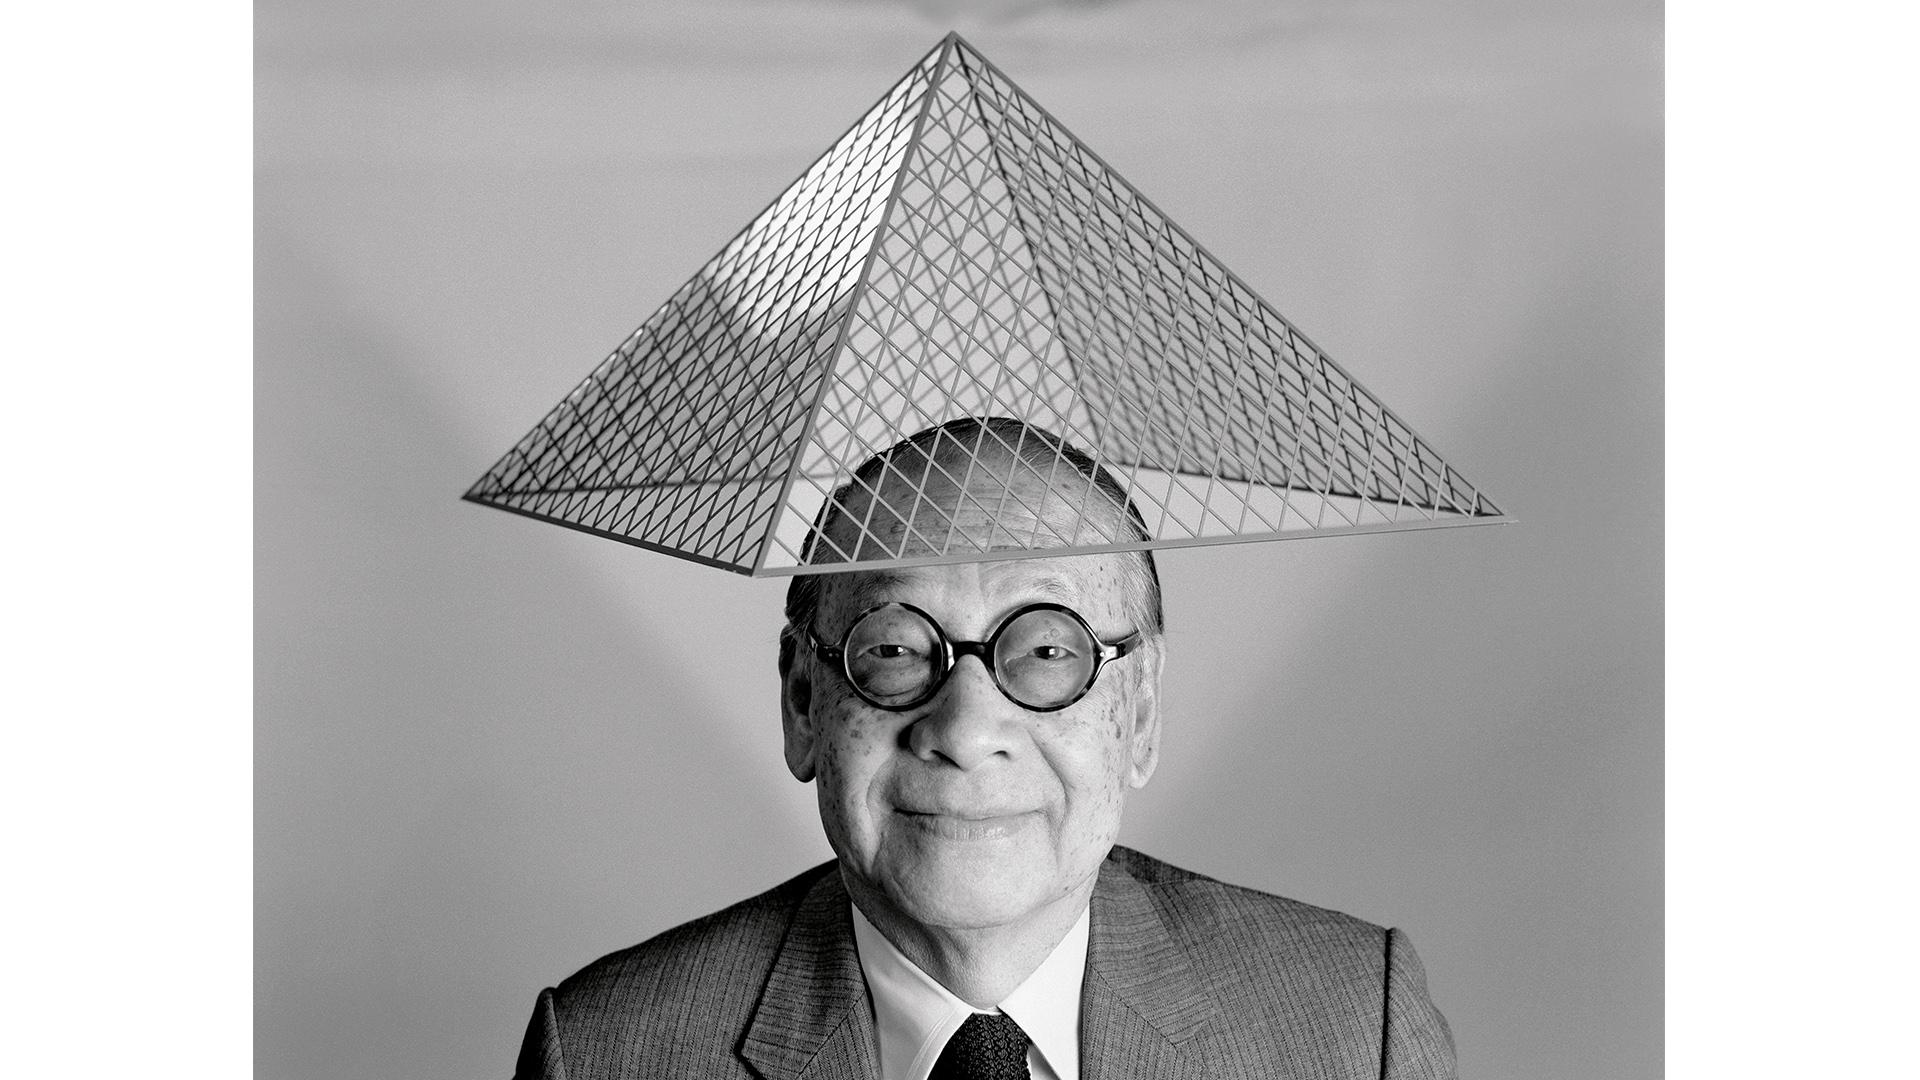 Ieoh Ming Pei, courtesy of Josef Astor